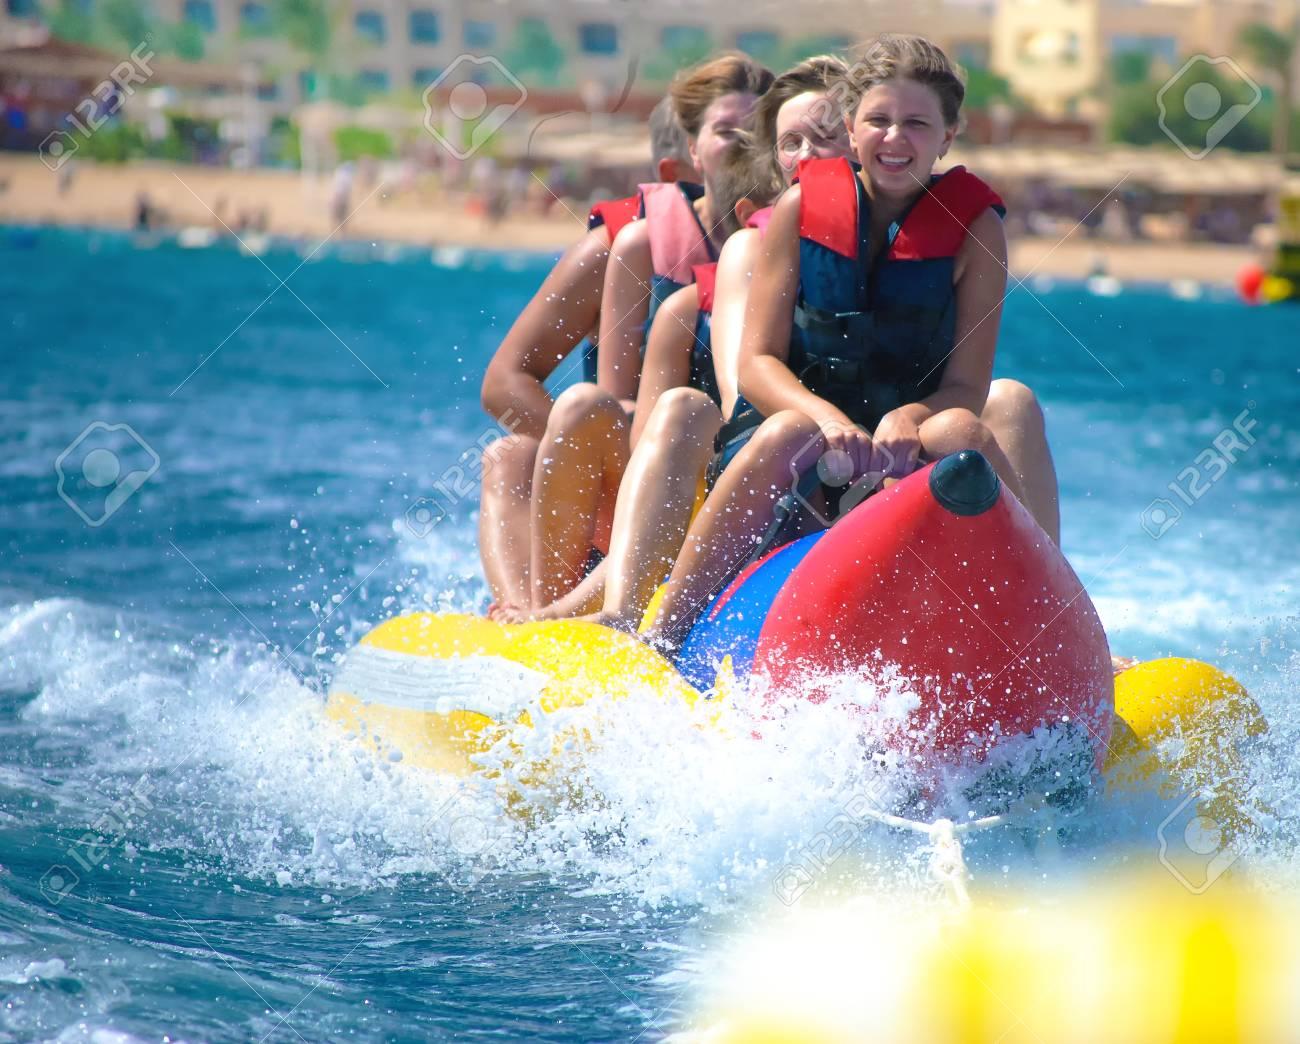 People ride on banana boat - 73580687